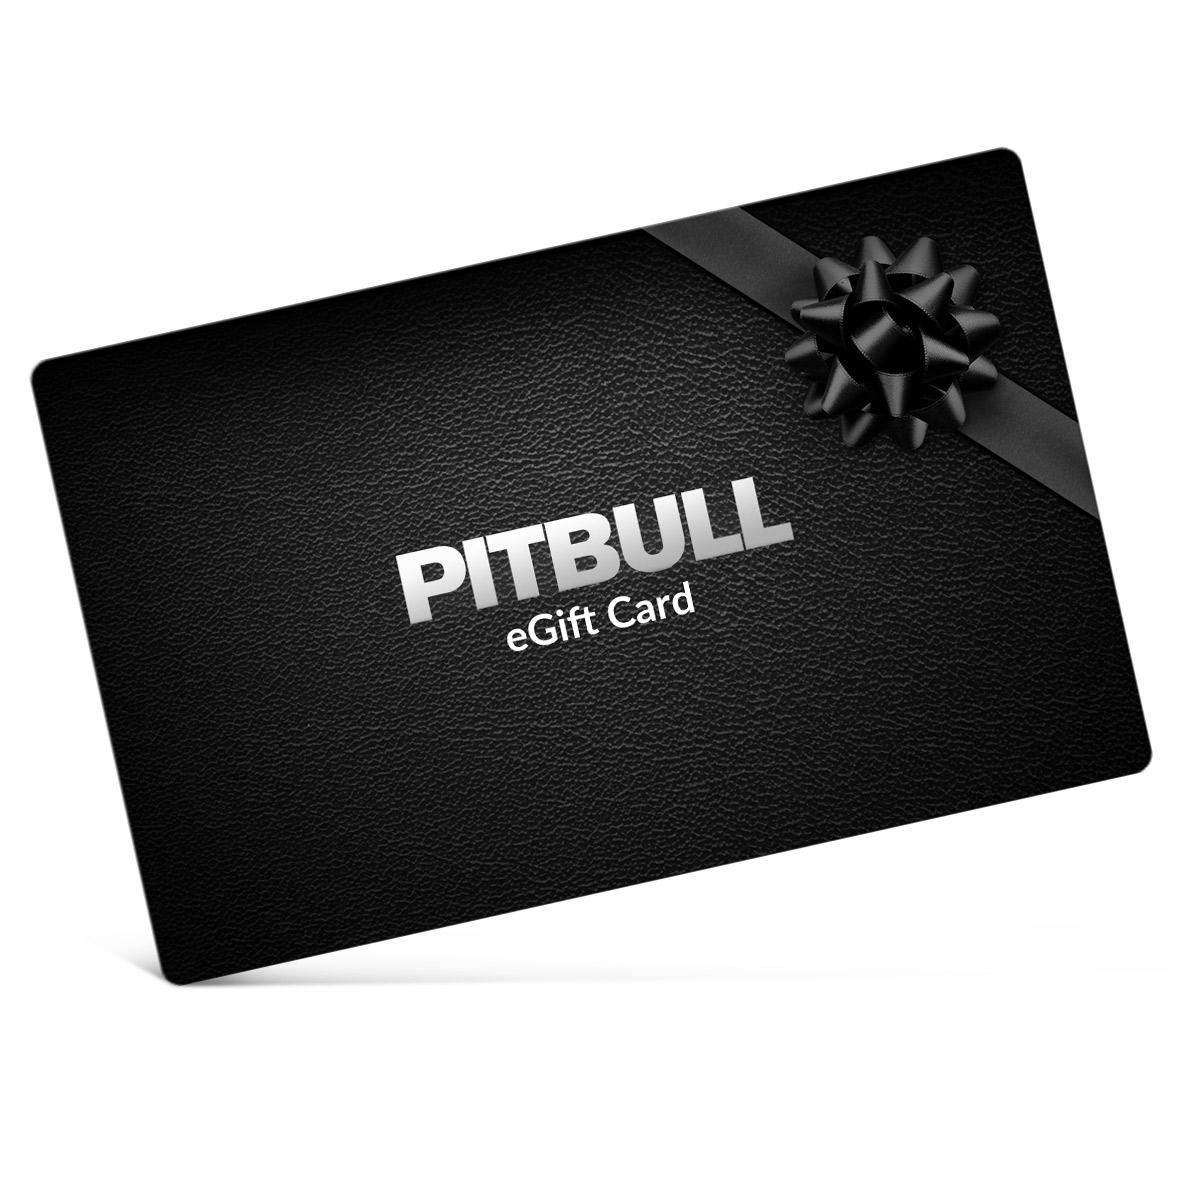 PITBULL eGift Card